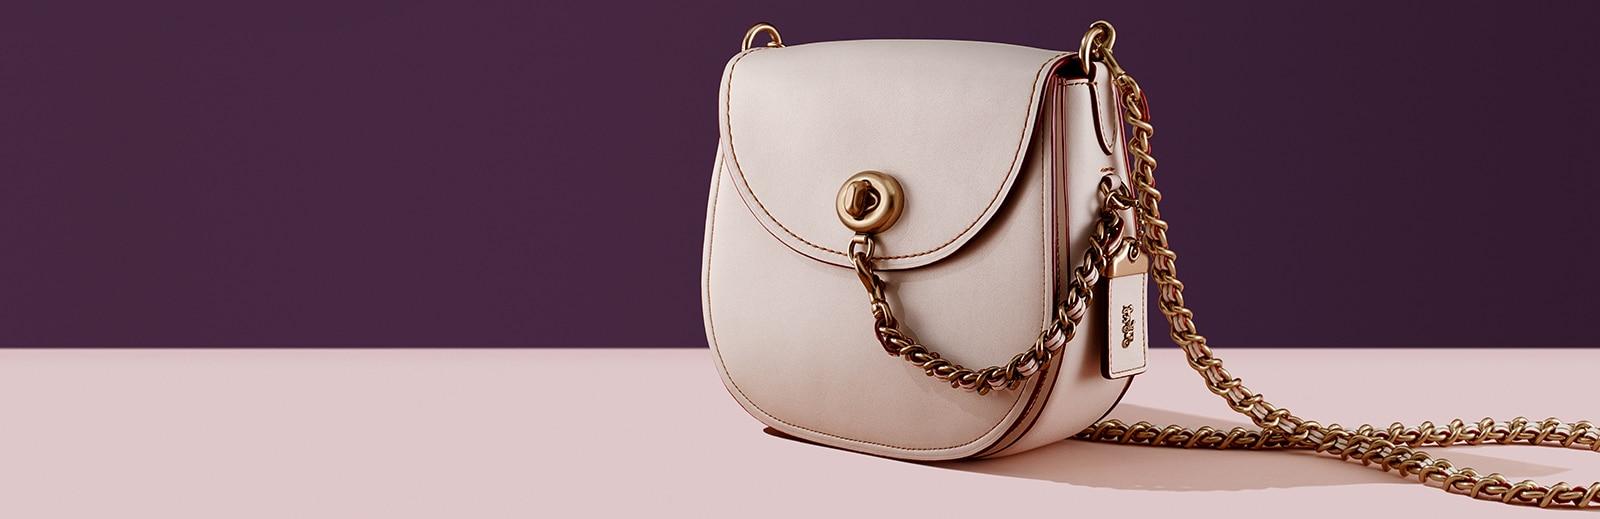 Shop Saddle Bags